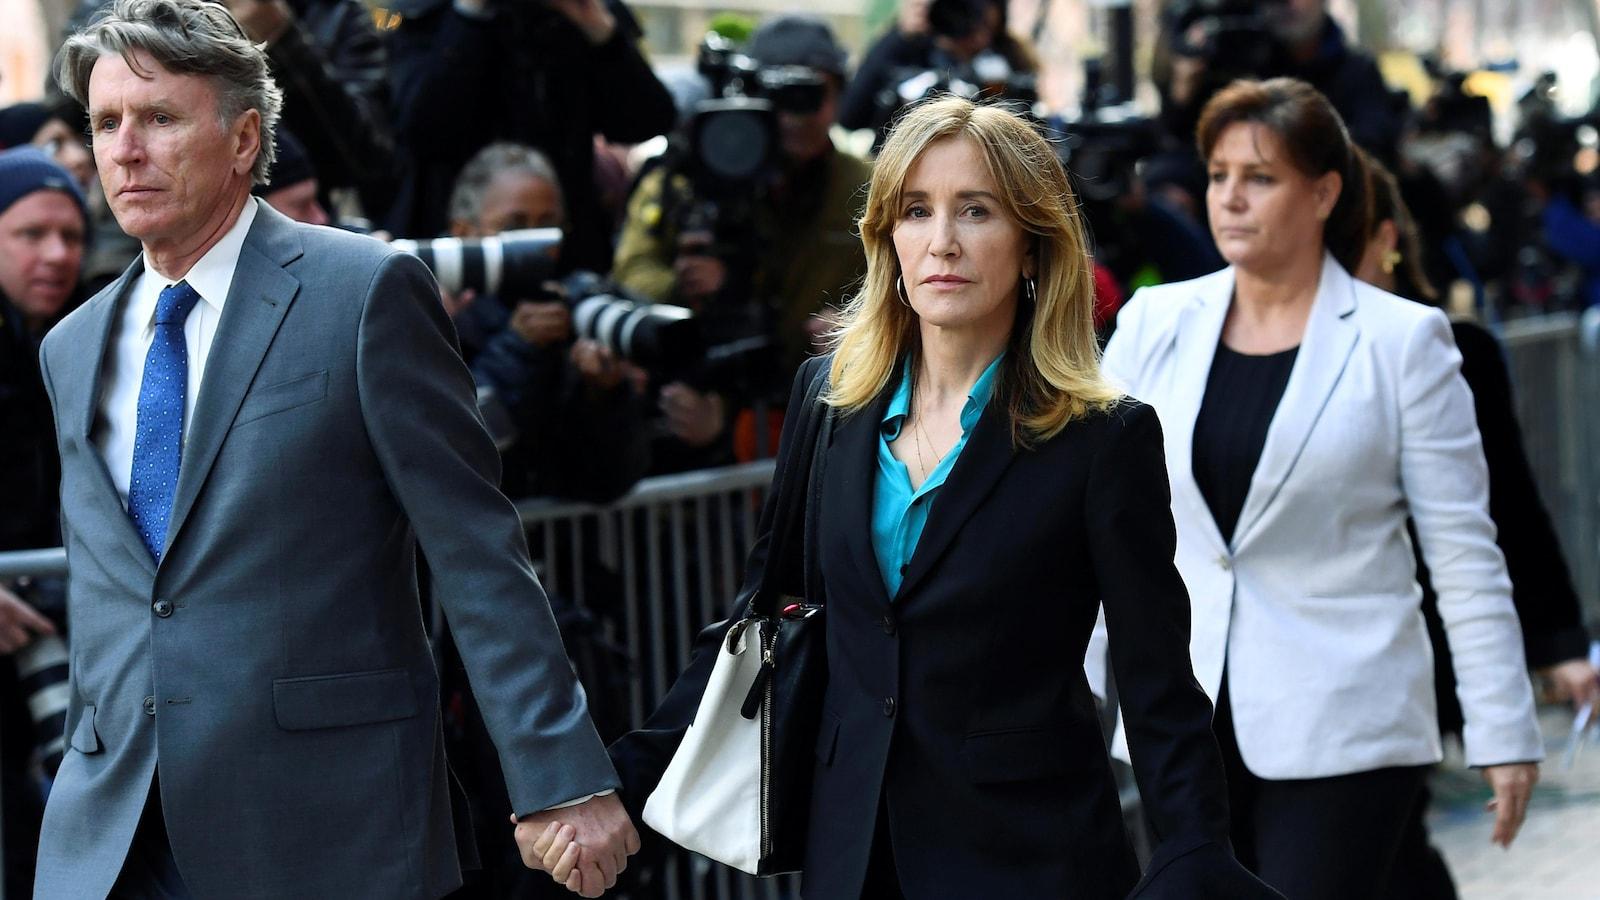 Felicity Huffman, héroïne de Desperate Housewives, va-t-elle aller en prison ?